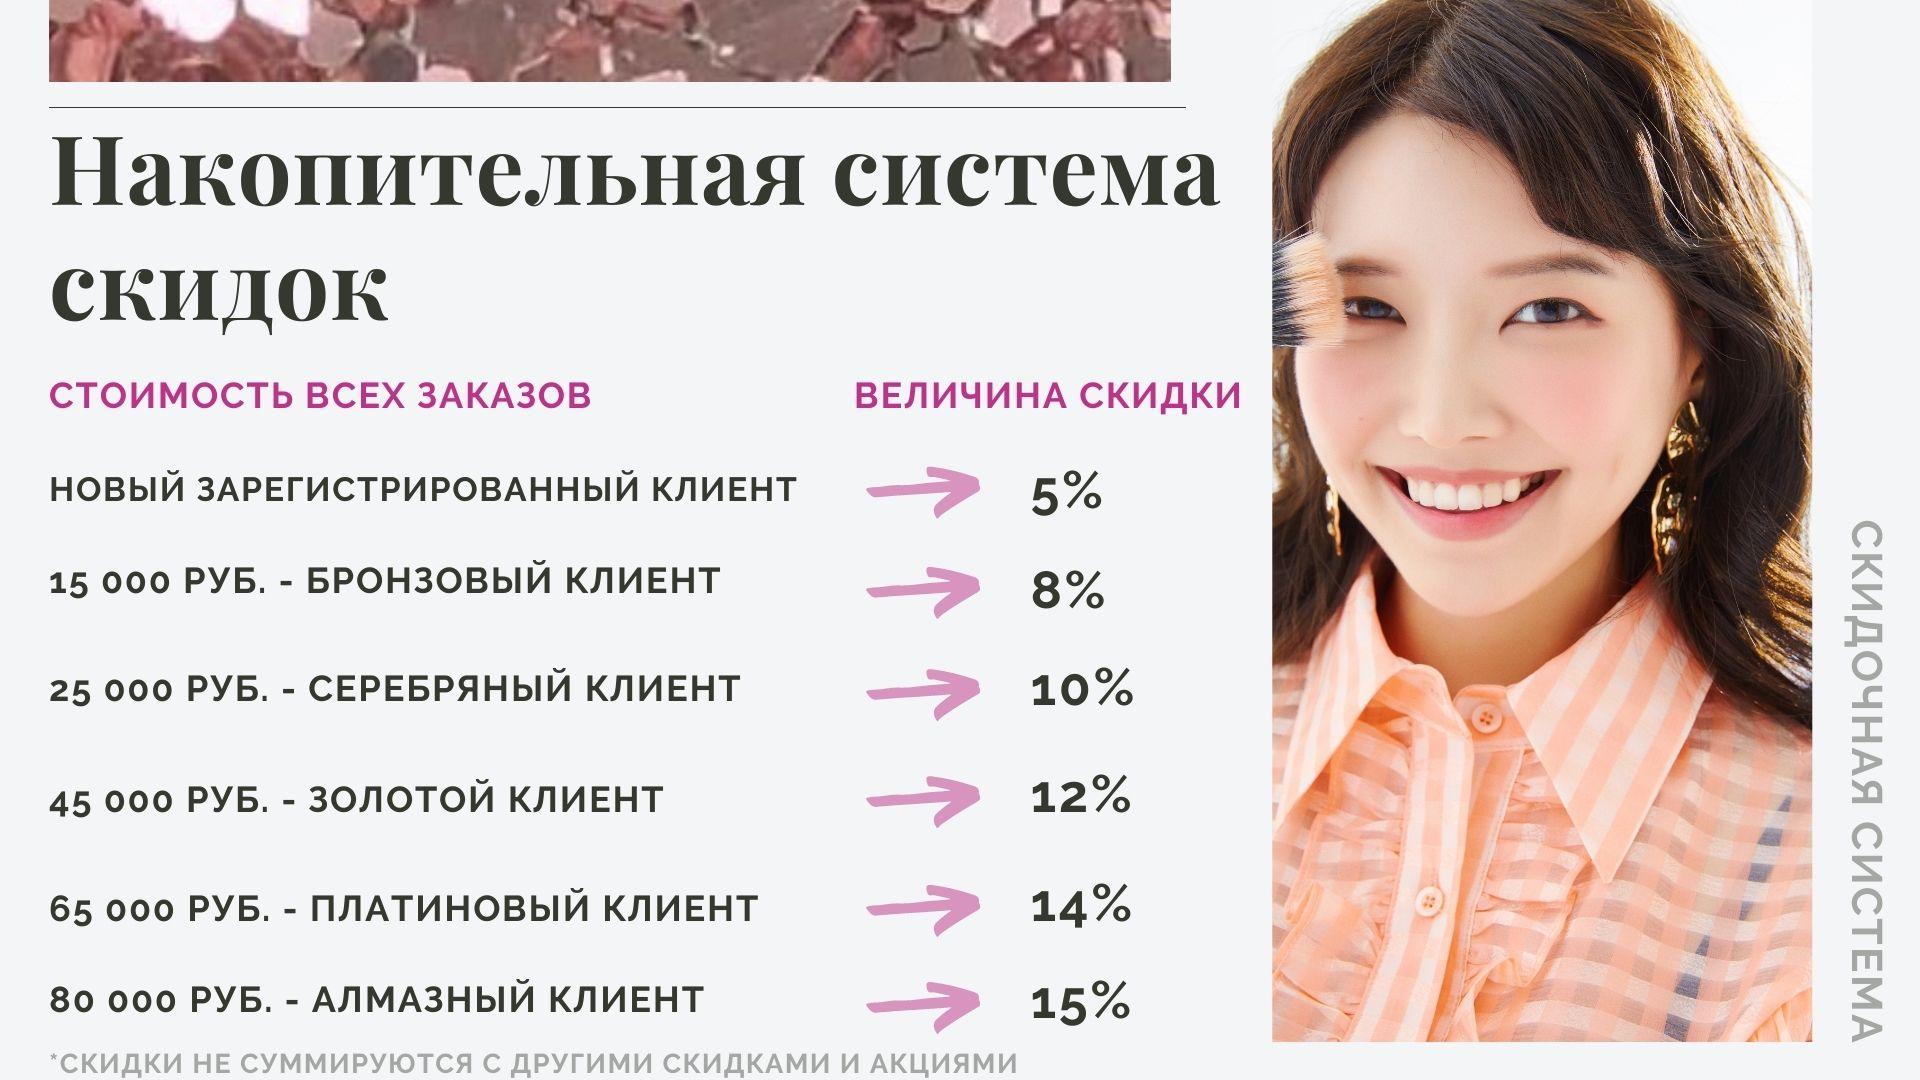 skidka13.jpg